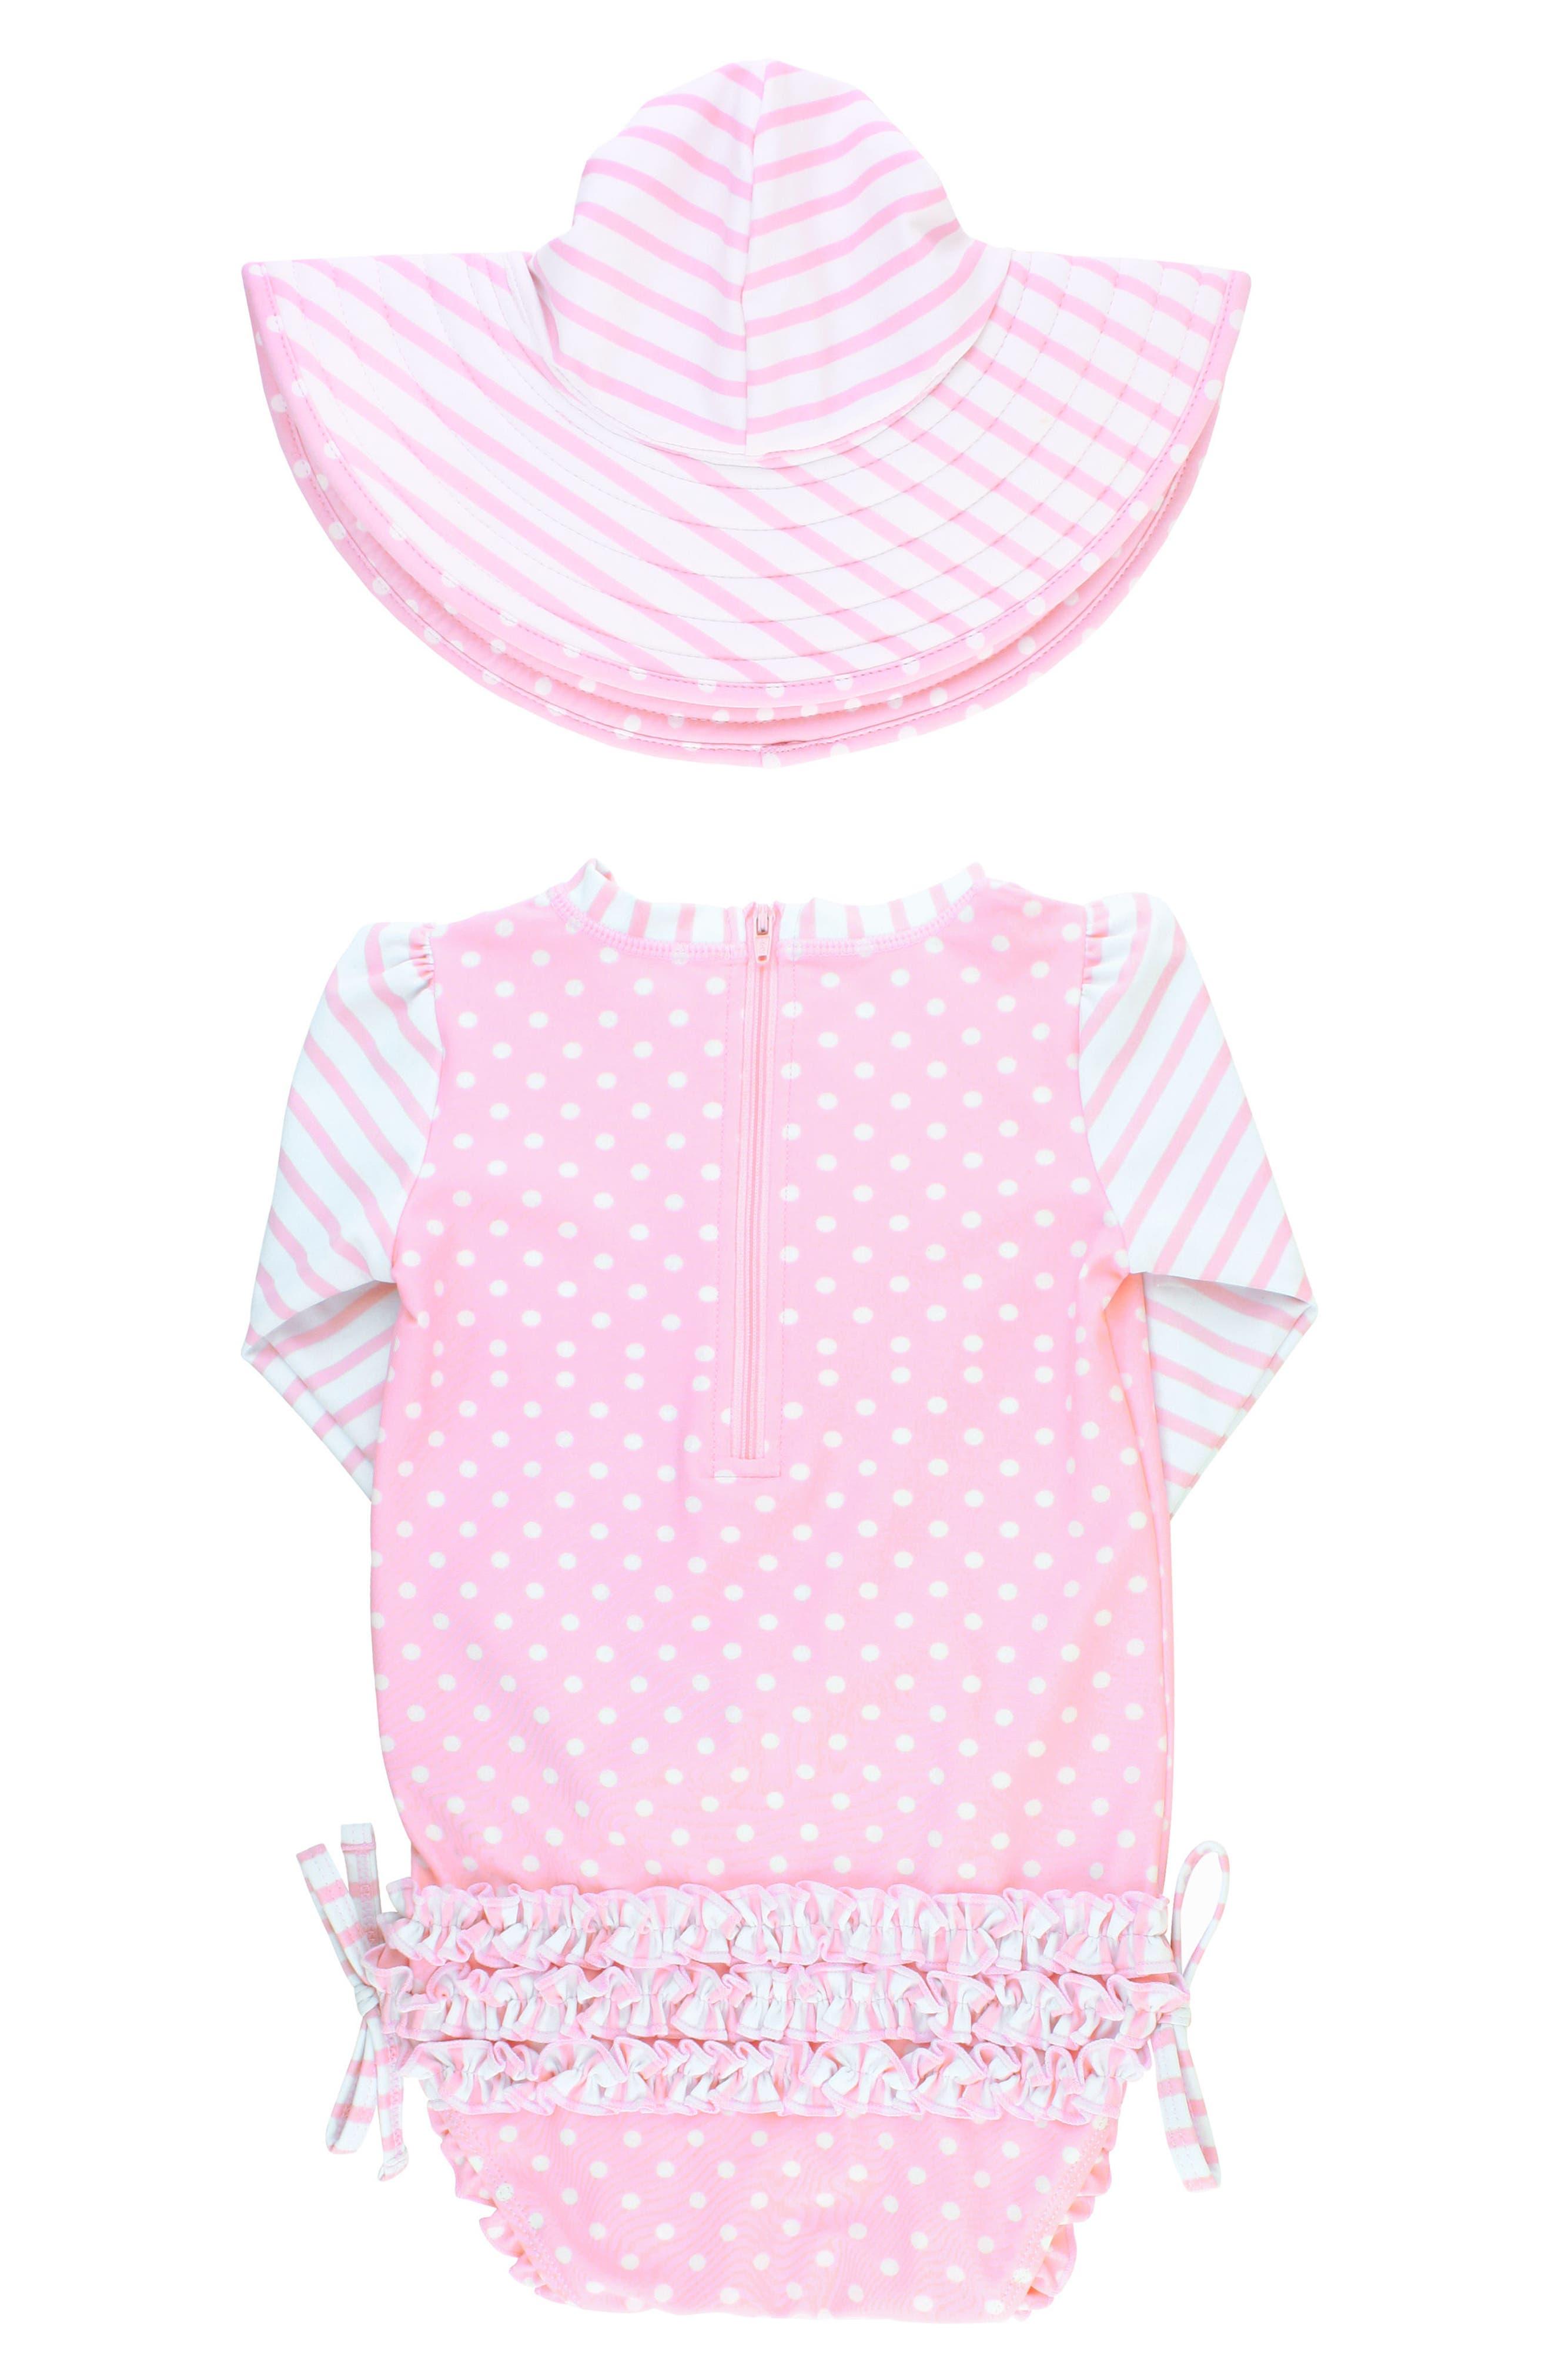 Ruffle Butts Polka Dot One-Piece Rashguard Swimsuit & Sun Hat Set,                             Alternate thumbnail 3, color,                             PINK